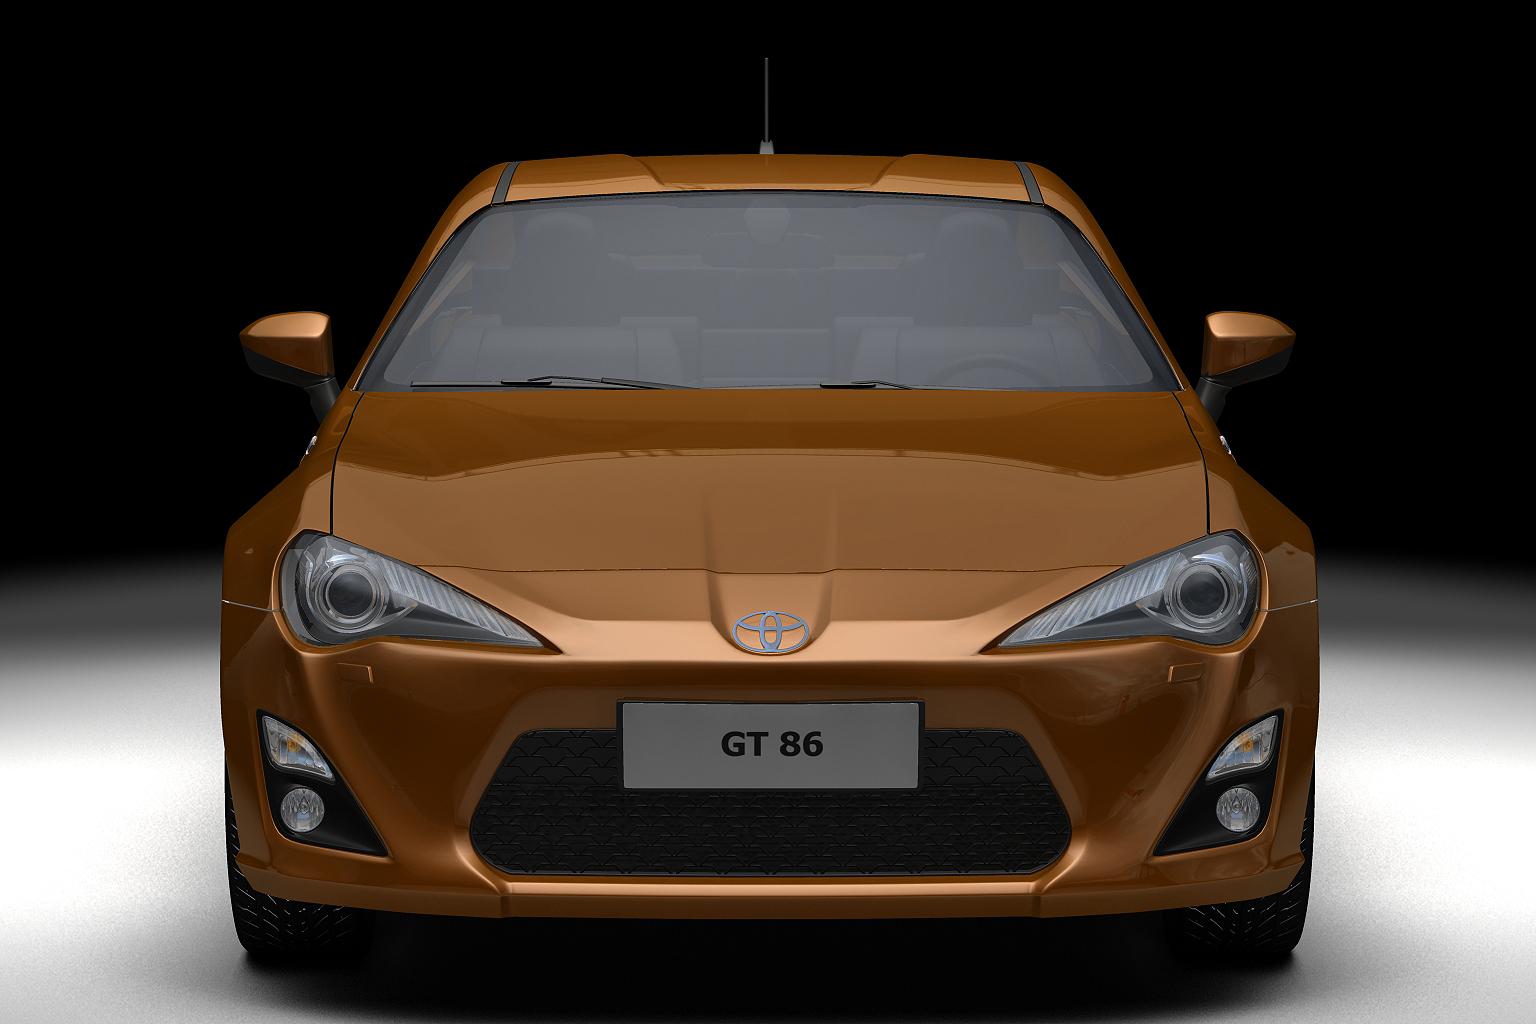 2013 toyota gt 86 3d model 3ds max fbx c4d lwo hrc xsi obj 136156